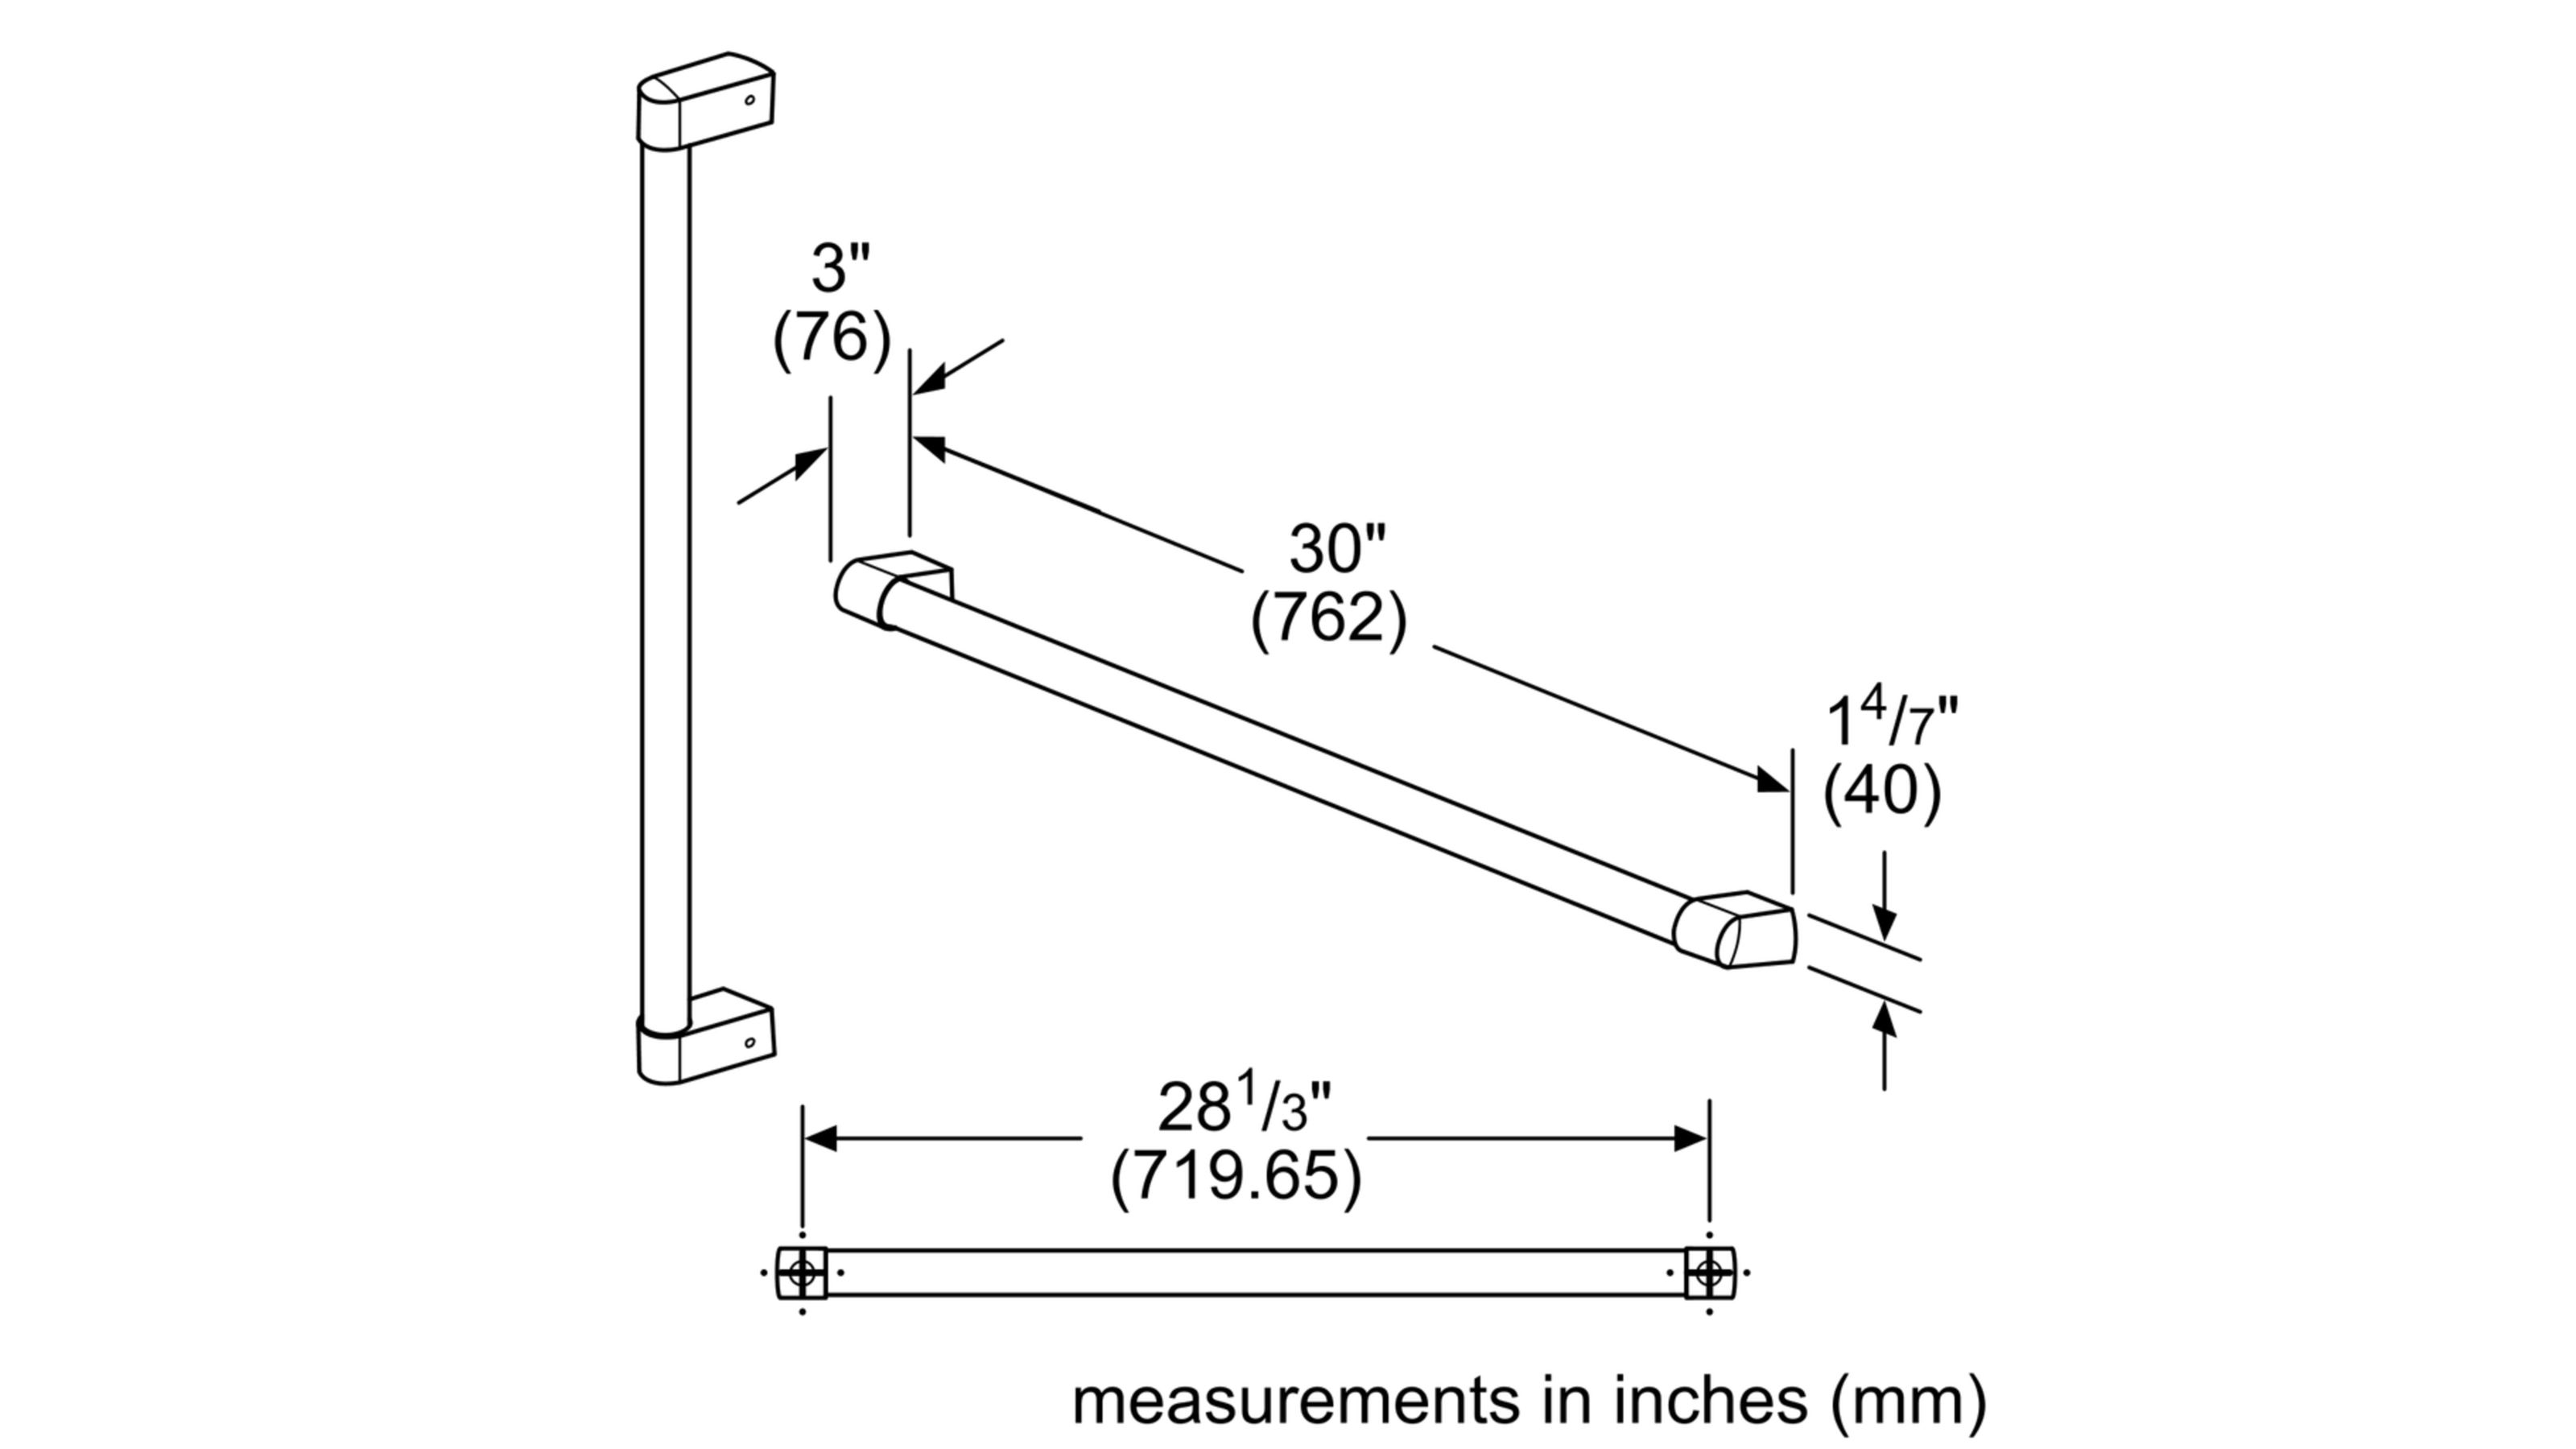 Model: BOHANDL40 | Freestanding Refrigeration Pro-style Handle Kit Accessory, 4 Handles